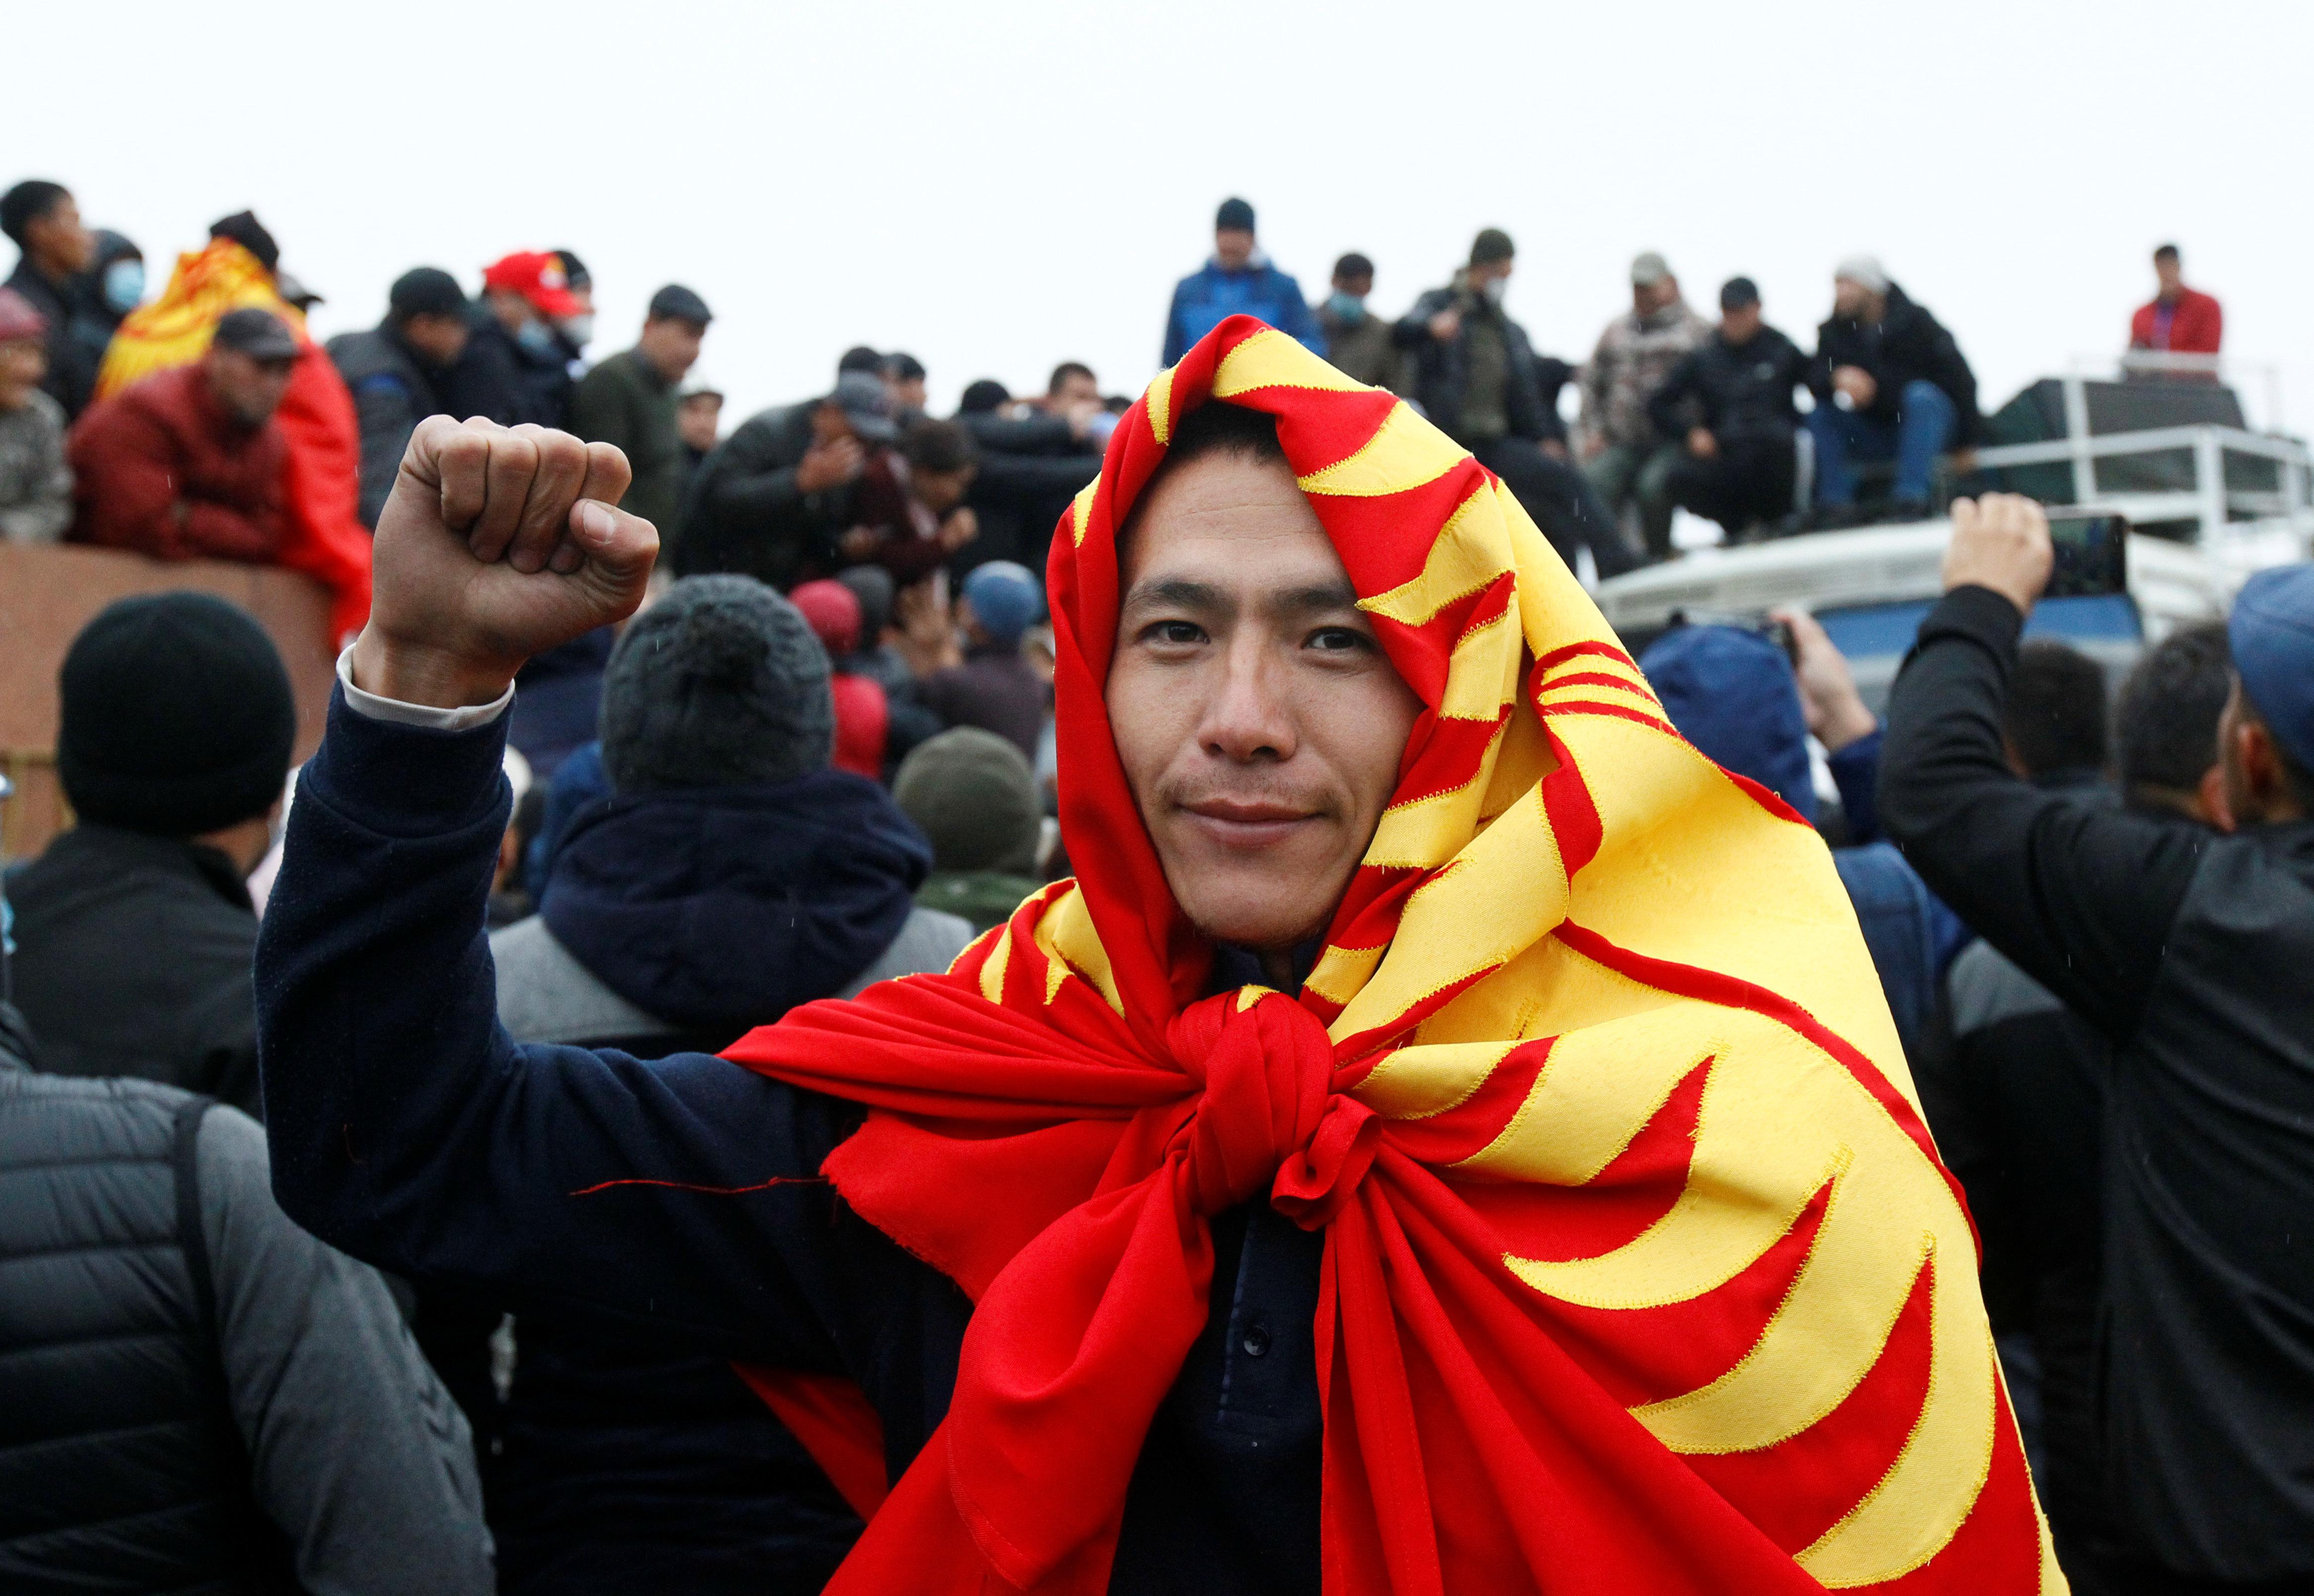 На фоне протестов в Киргизии прошел митинг в поддержку президента